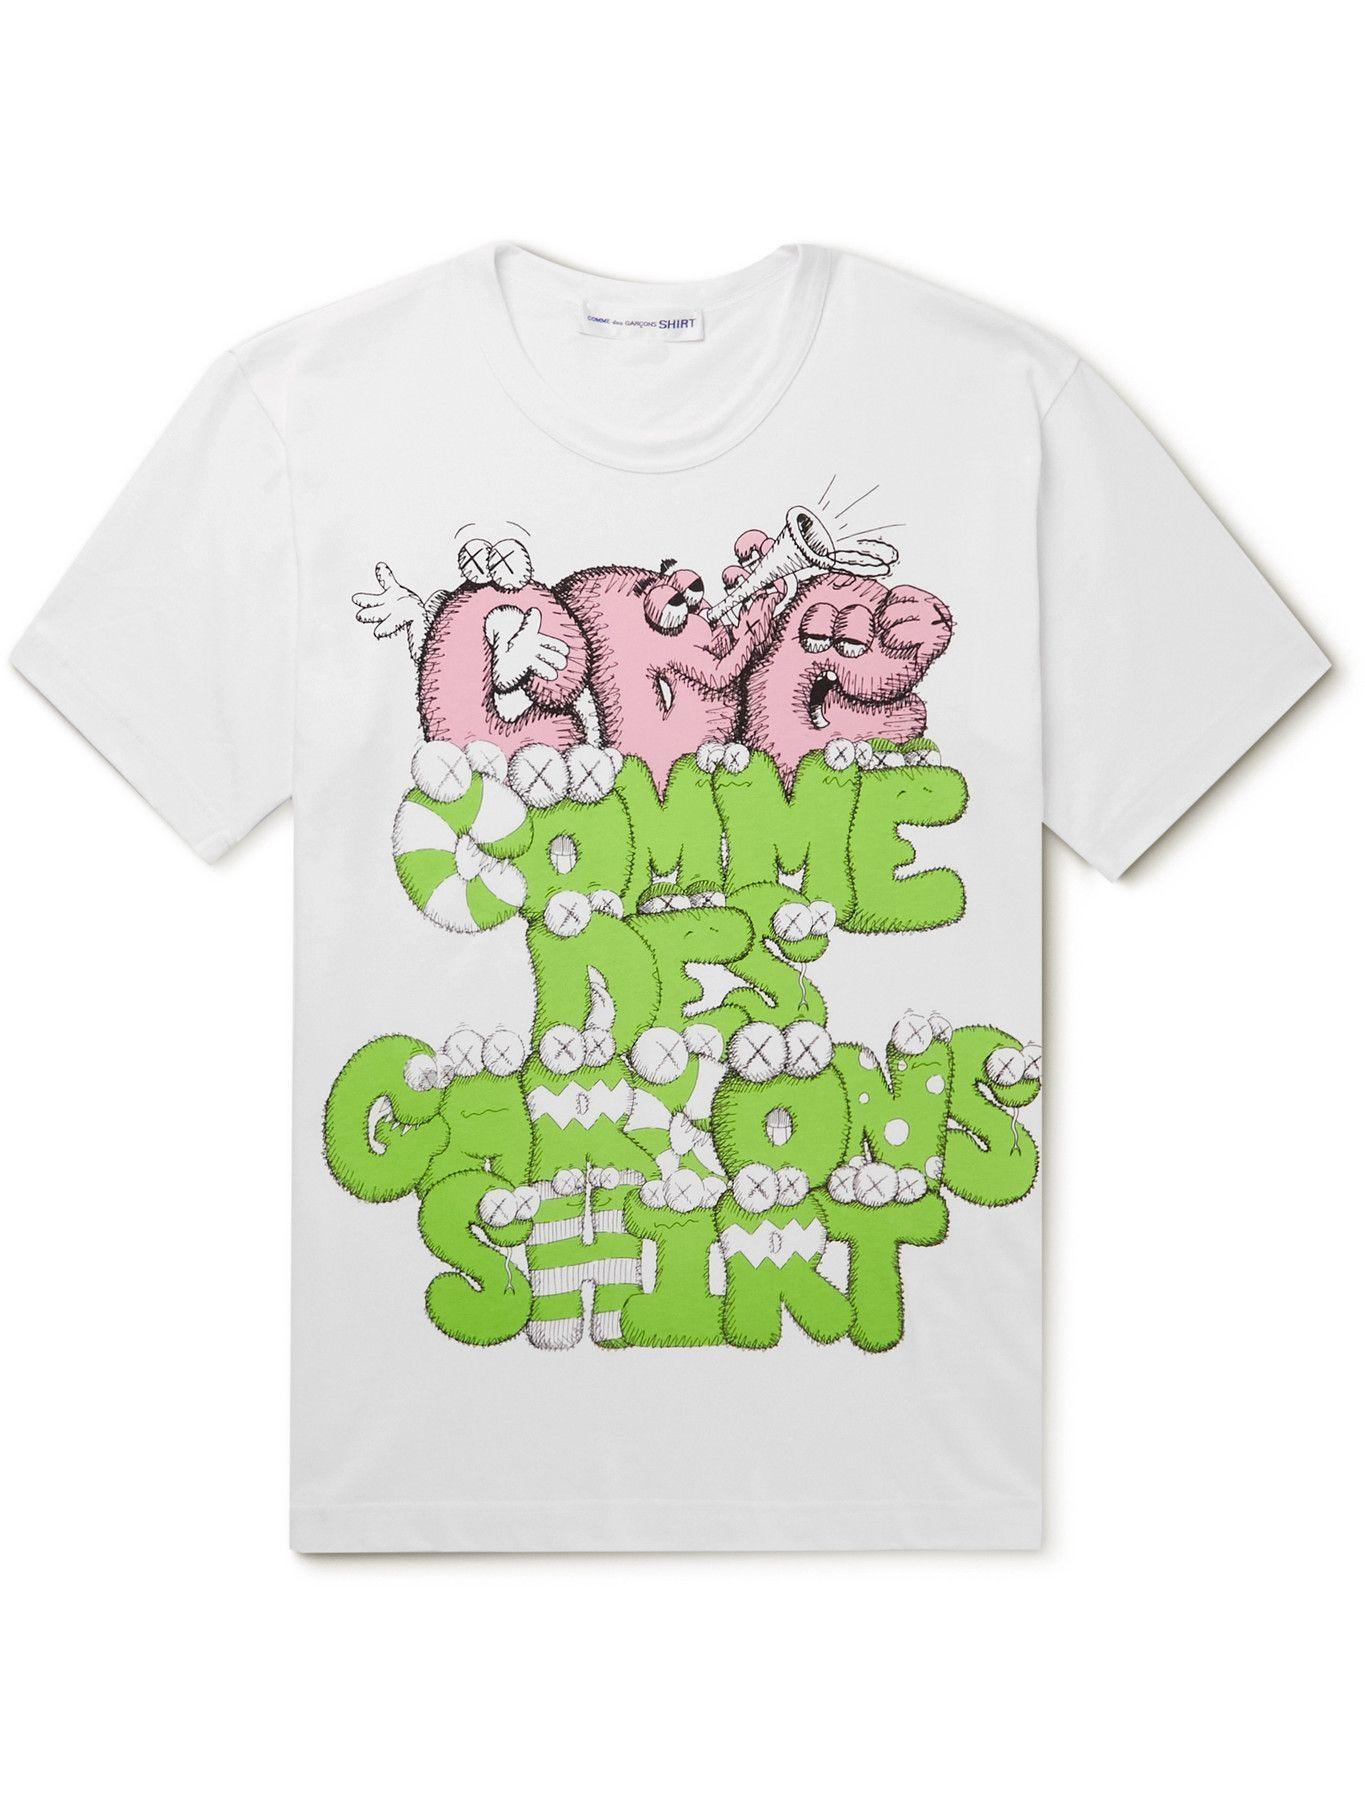 Photo: Comme des Garçons SHIRT - KAWS Printed Cotton-Jersey T-Shirt - White